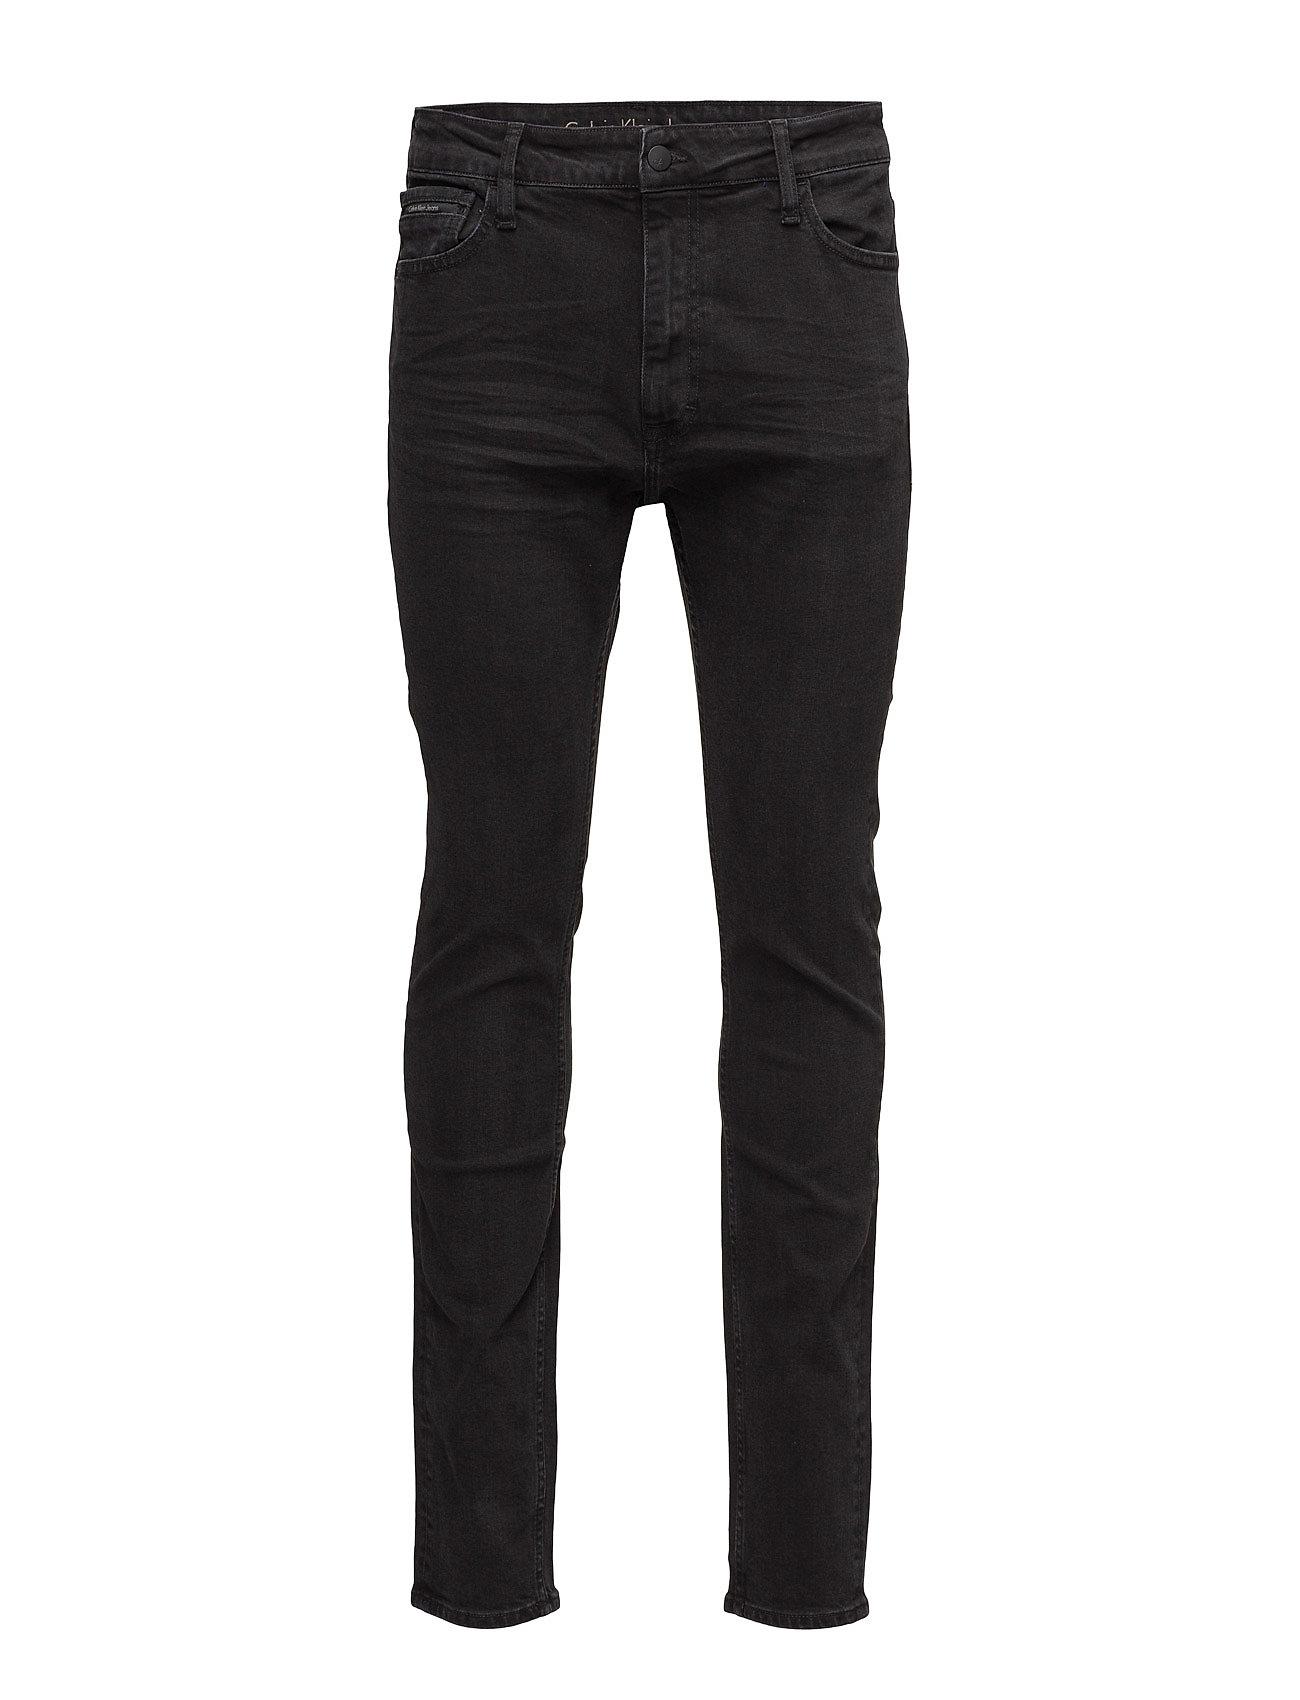 calvin klein jeans – Skinny taper - black fra boozt.com dk